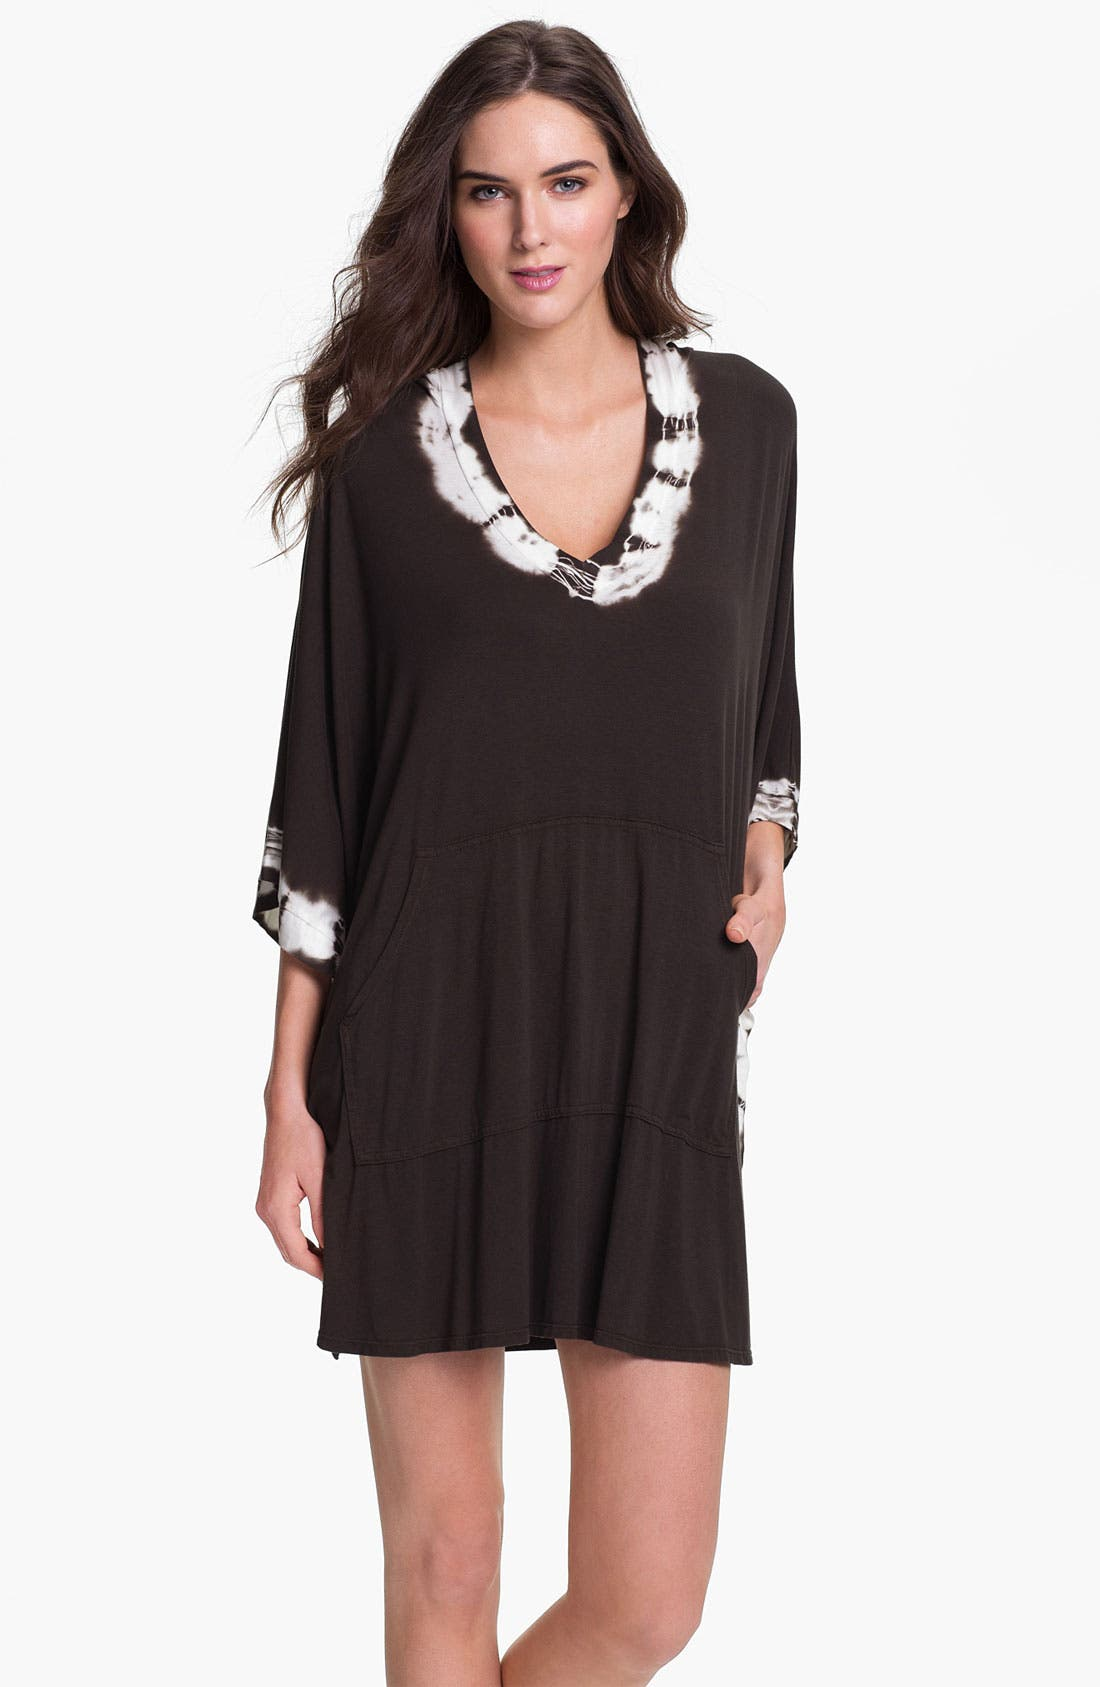 Main Image - Lucky Brand Swimwear 'Summer Lovin' Hooded Dress